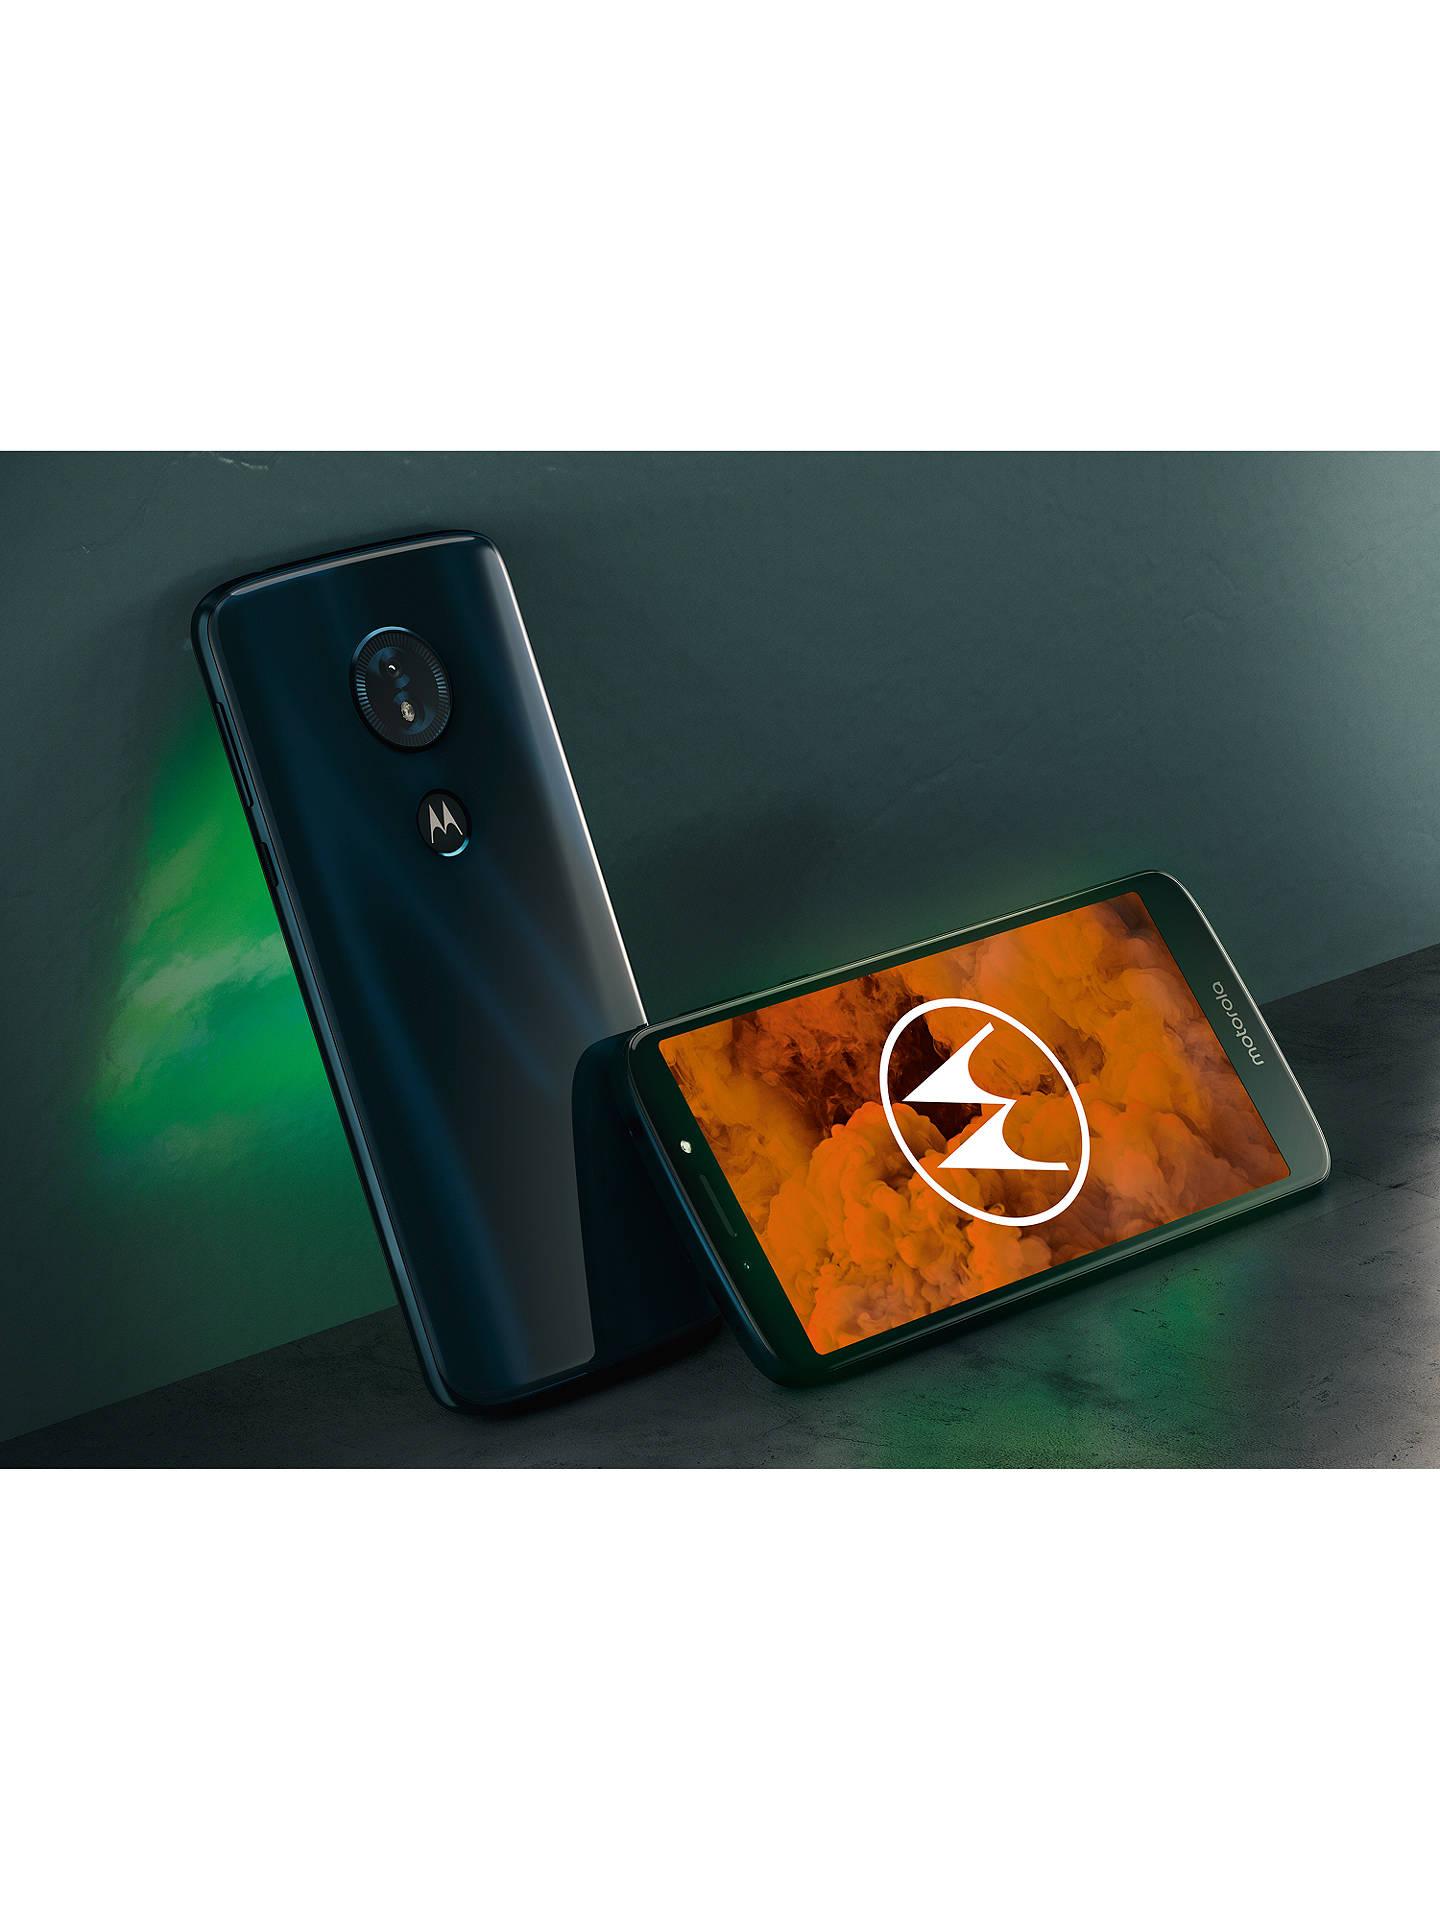 Motorola g6 play SIM Free Smartphone, Android, 5 7